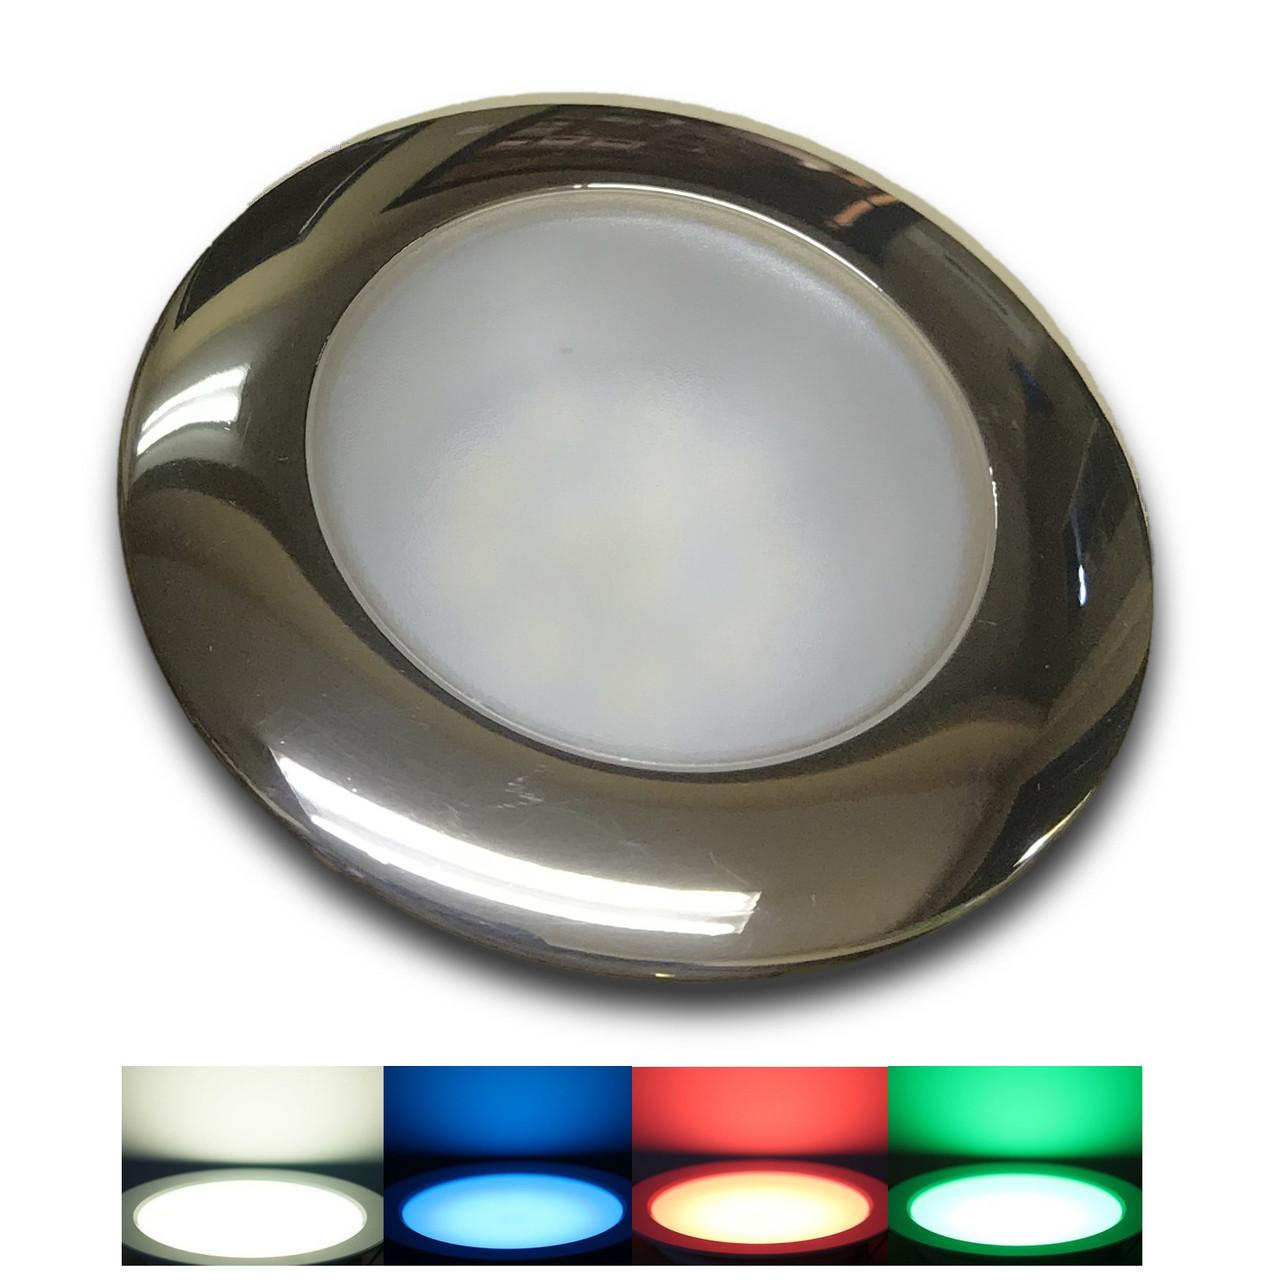 Recessed Color Changing LED Cockpit Light   W - B - R - G